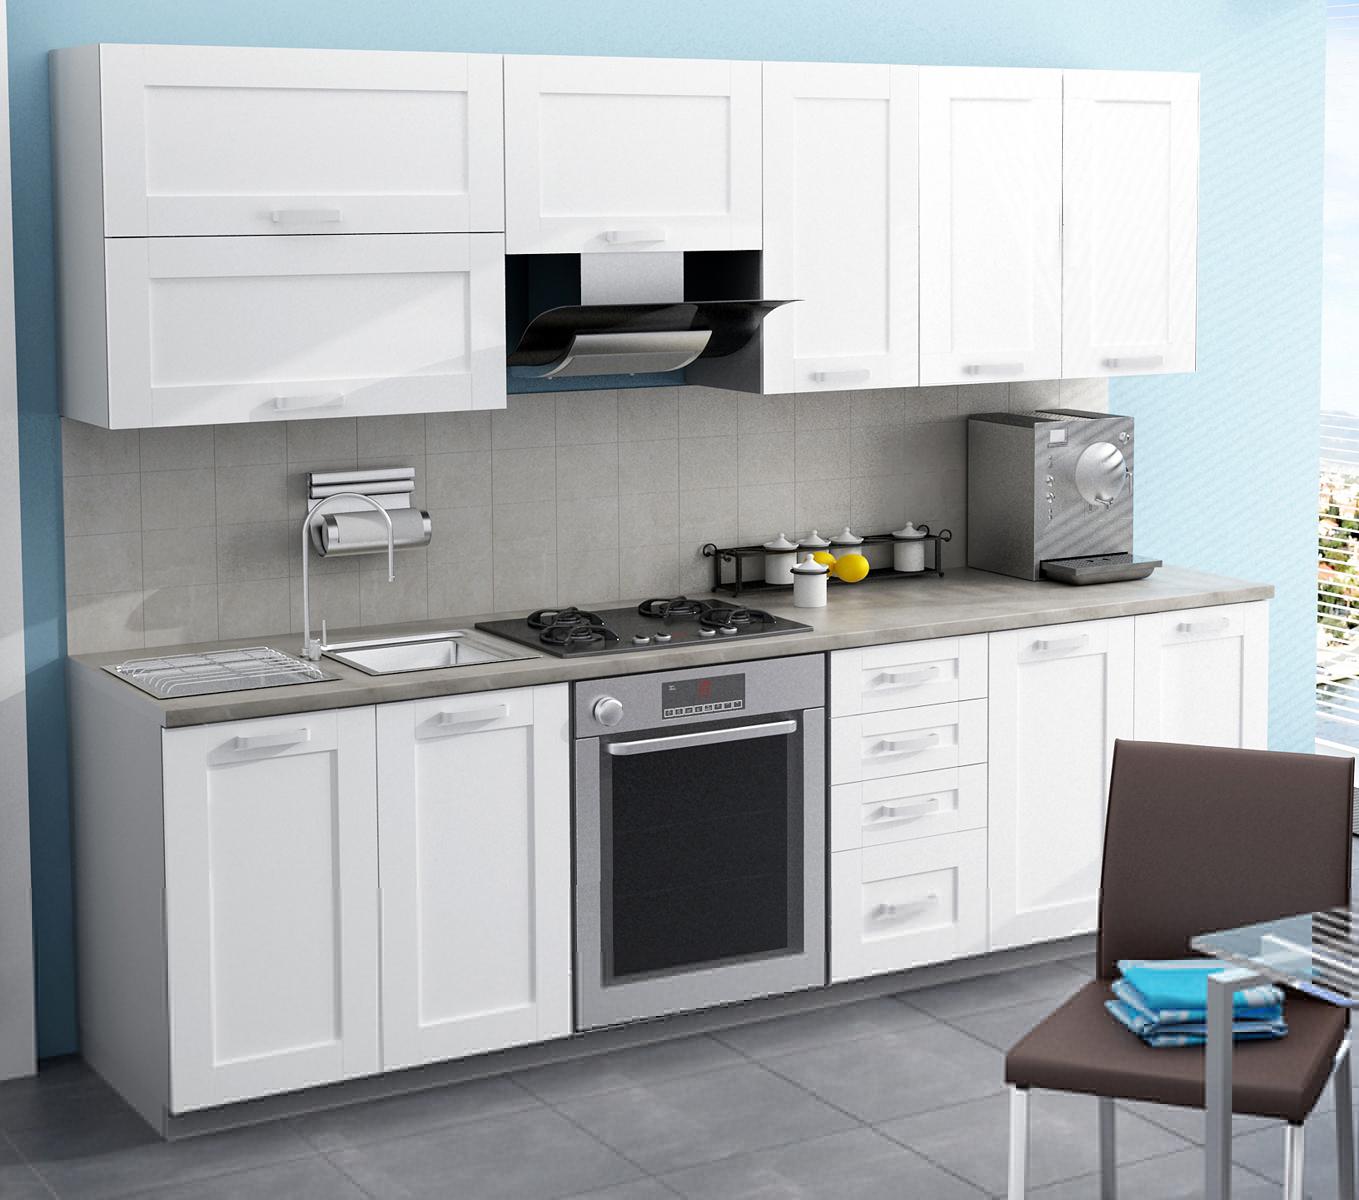 Kuchyně - Famm - Venus 240 cm